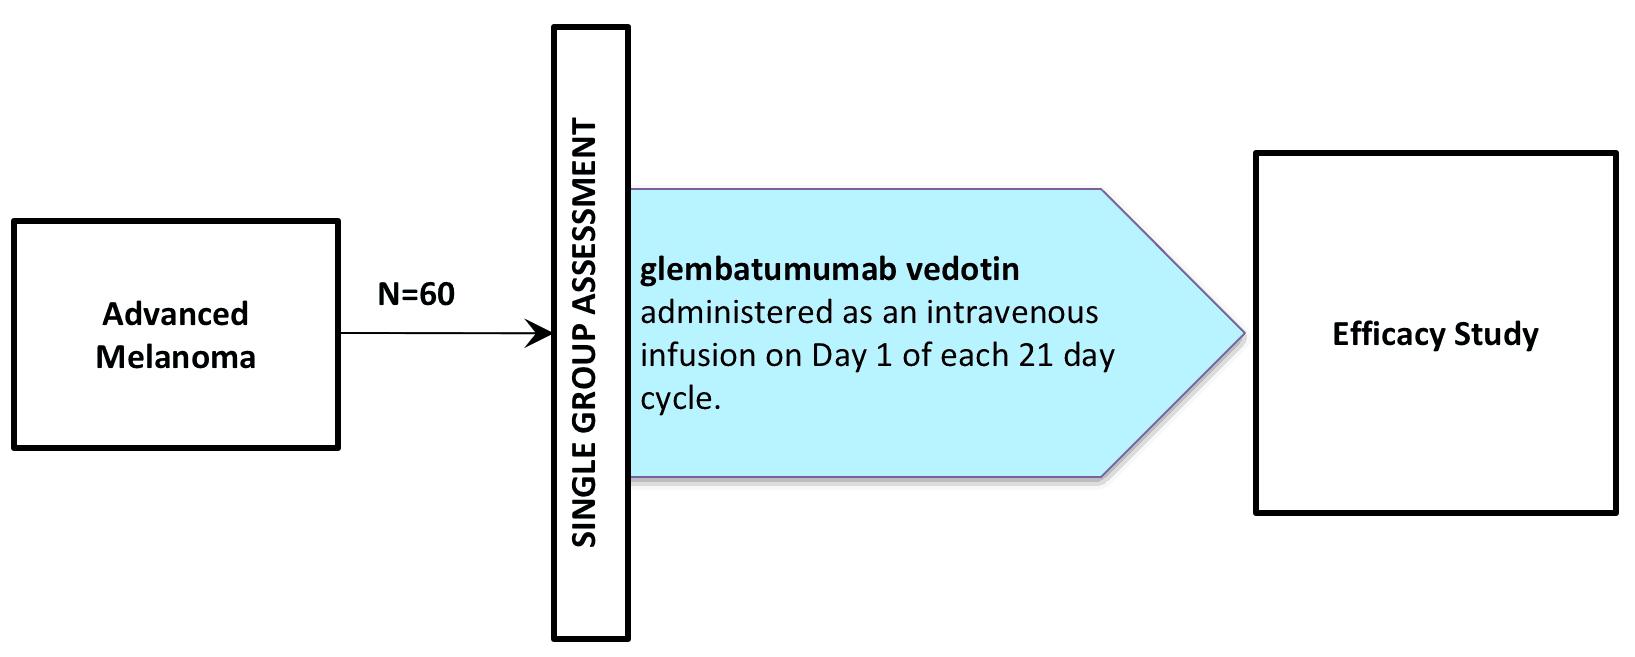 NCT02302339 (CLINICAL TRIAL / GLEMBATUMUMAB VEDOTIN / CDX-011 / CR011-VCMMAE)